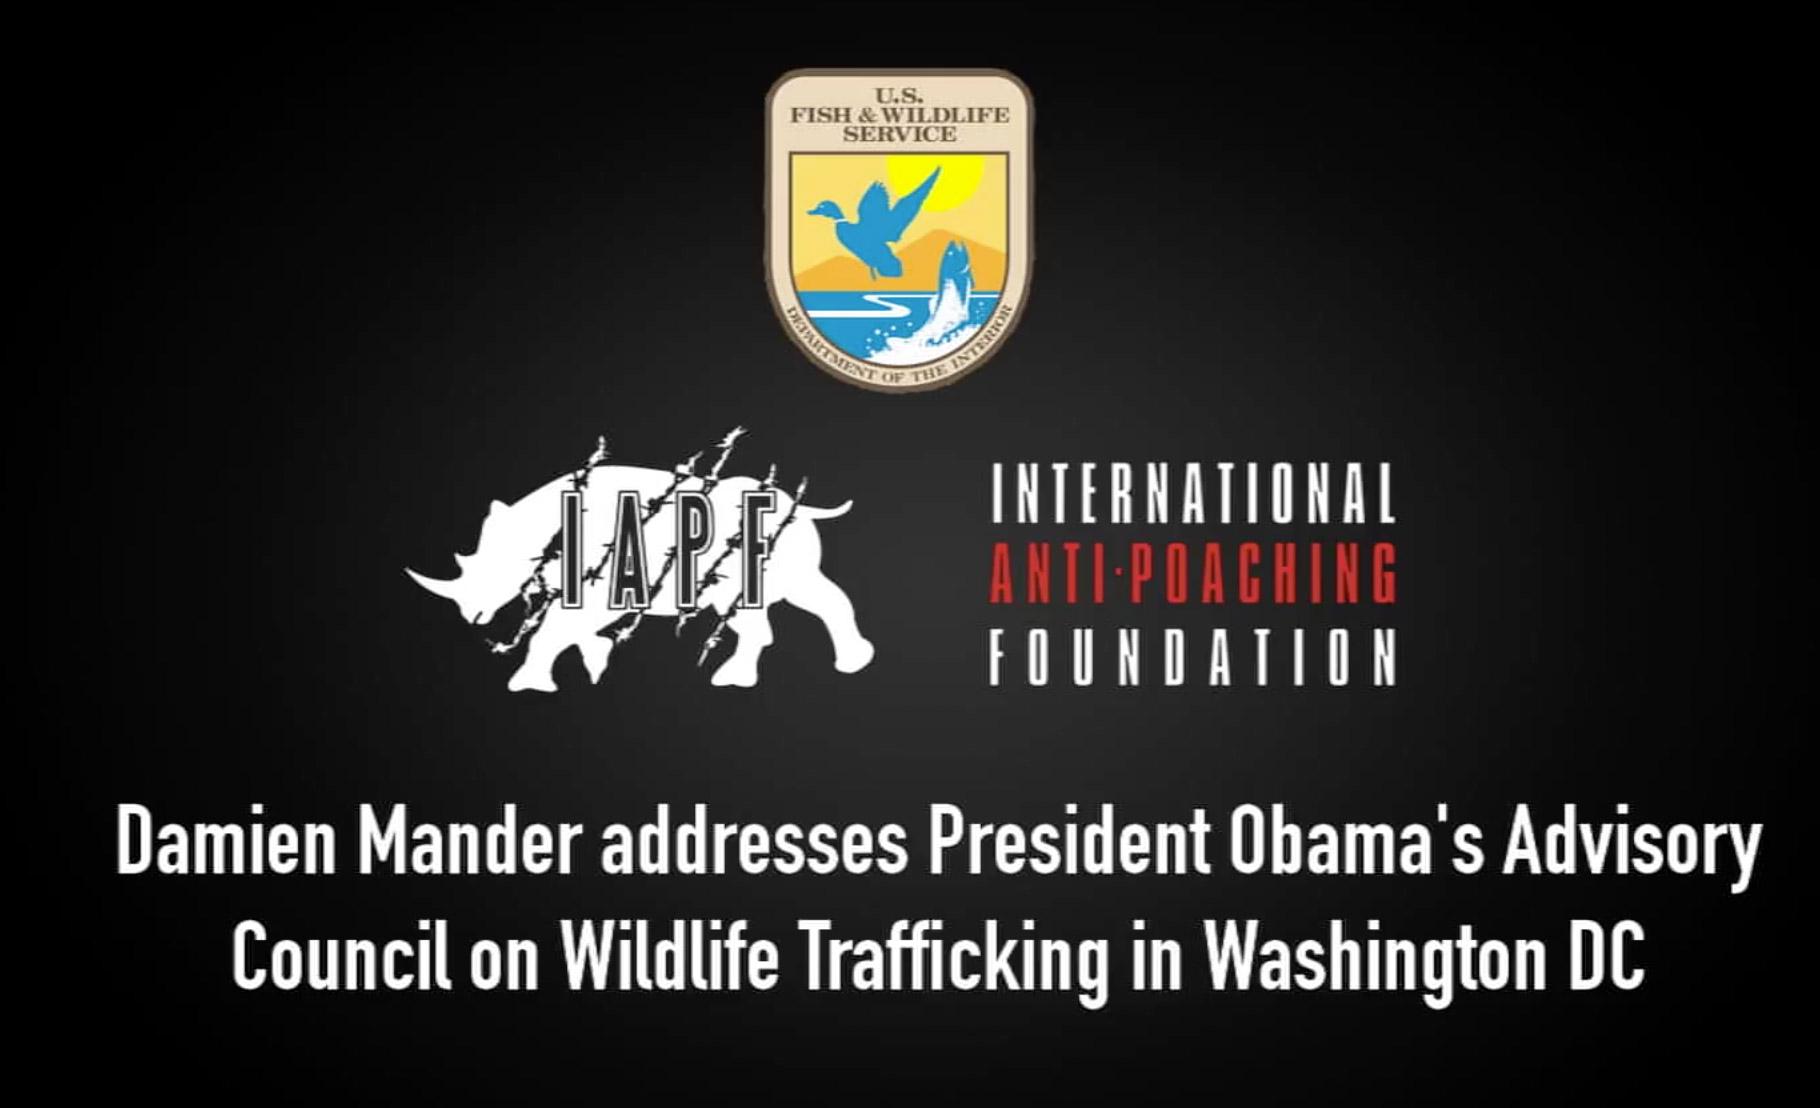 Damien Mander addresses President Obama's Advisory Council on Wildlife Trafficking in Washington DC